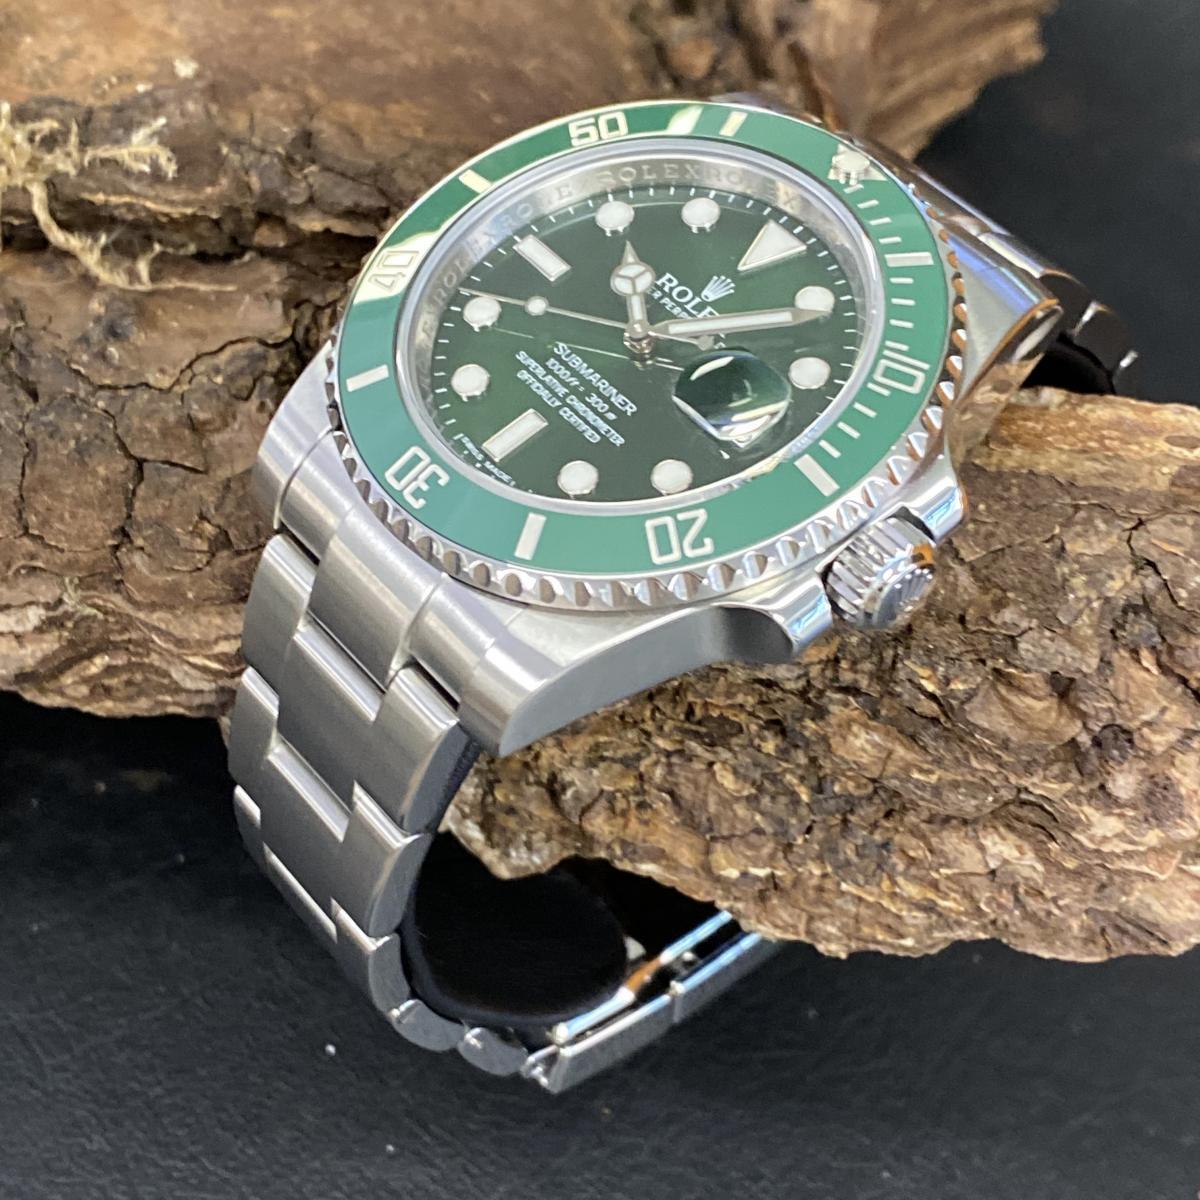 "Rolex Oyster Perpetual Submariner Date ""Hulk"" Ref. 116610LV"